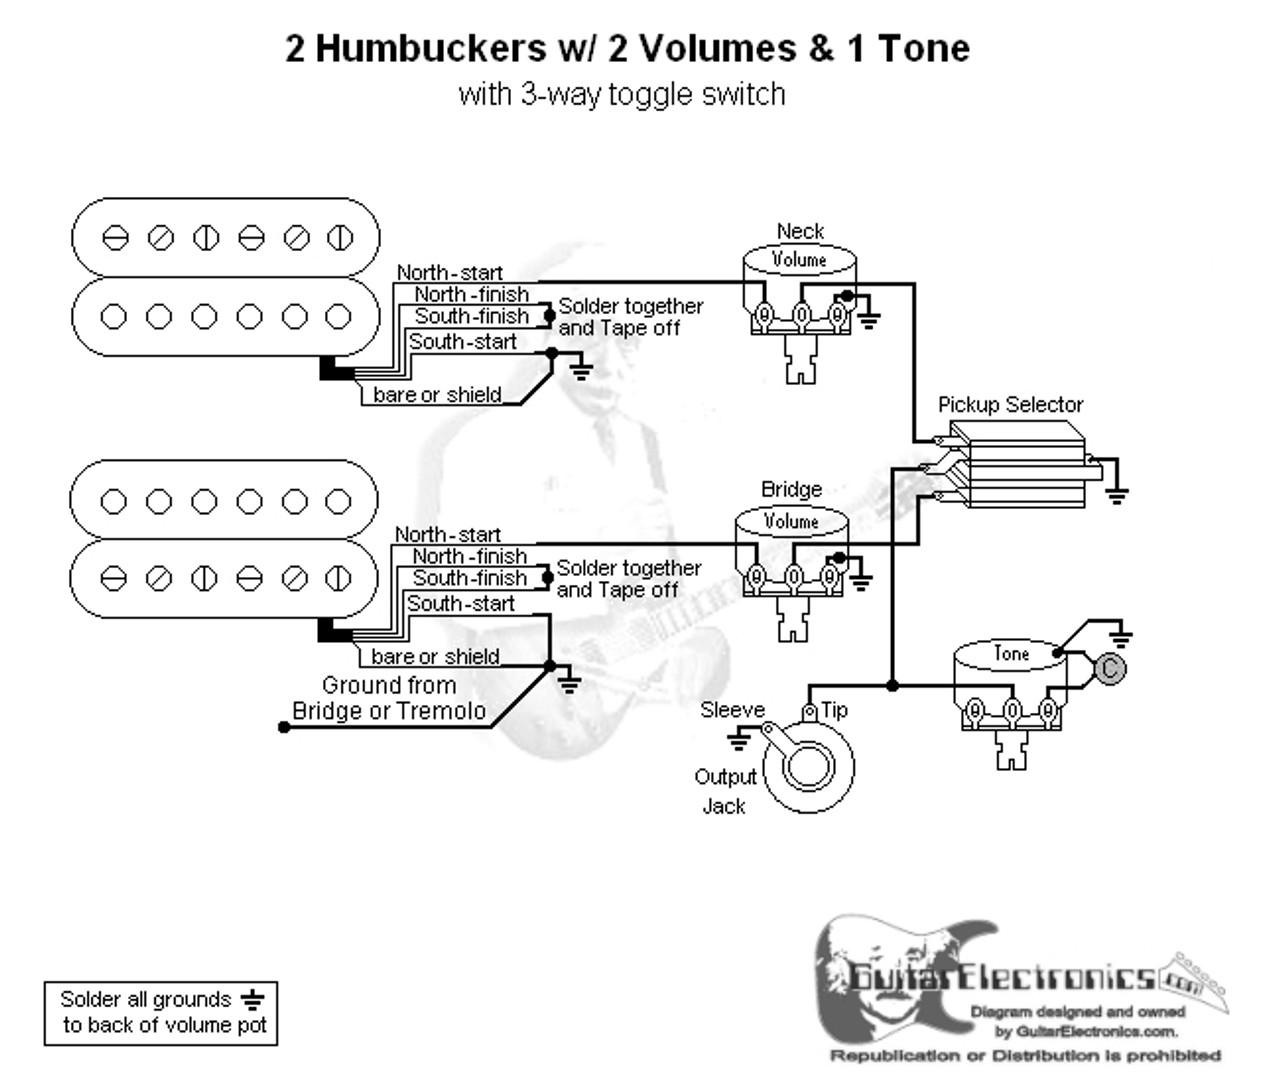 guitar wiring diagram 2 volume 1 tone wiring diagram img 2 humbuckers 3 way toggle switch [ 1280 x 1083 Pixel ]